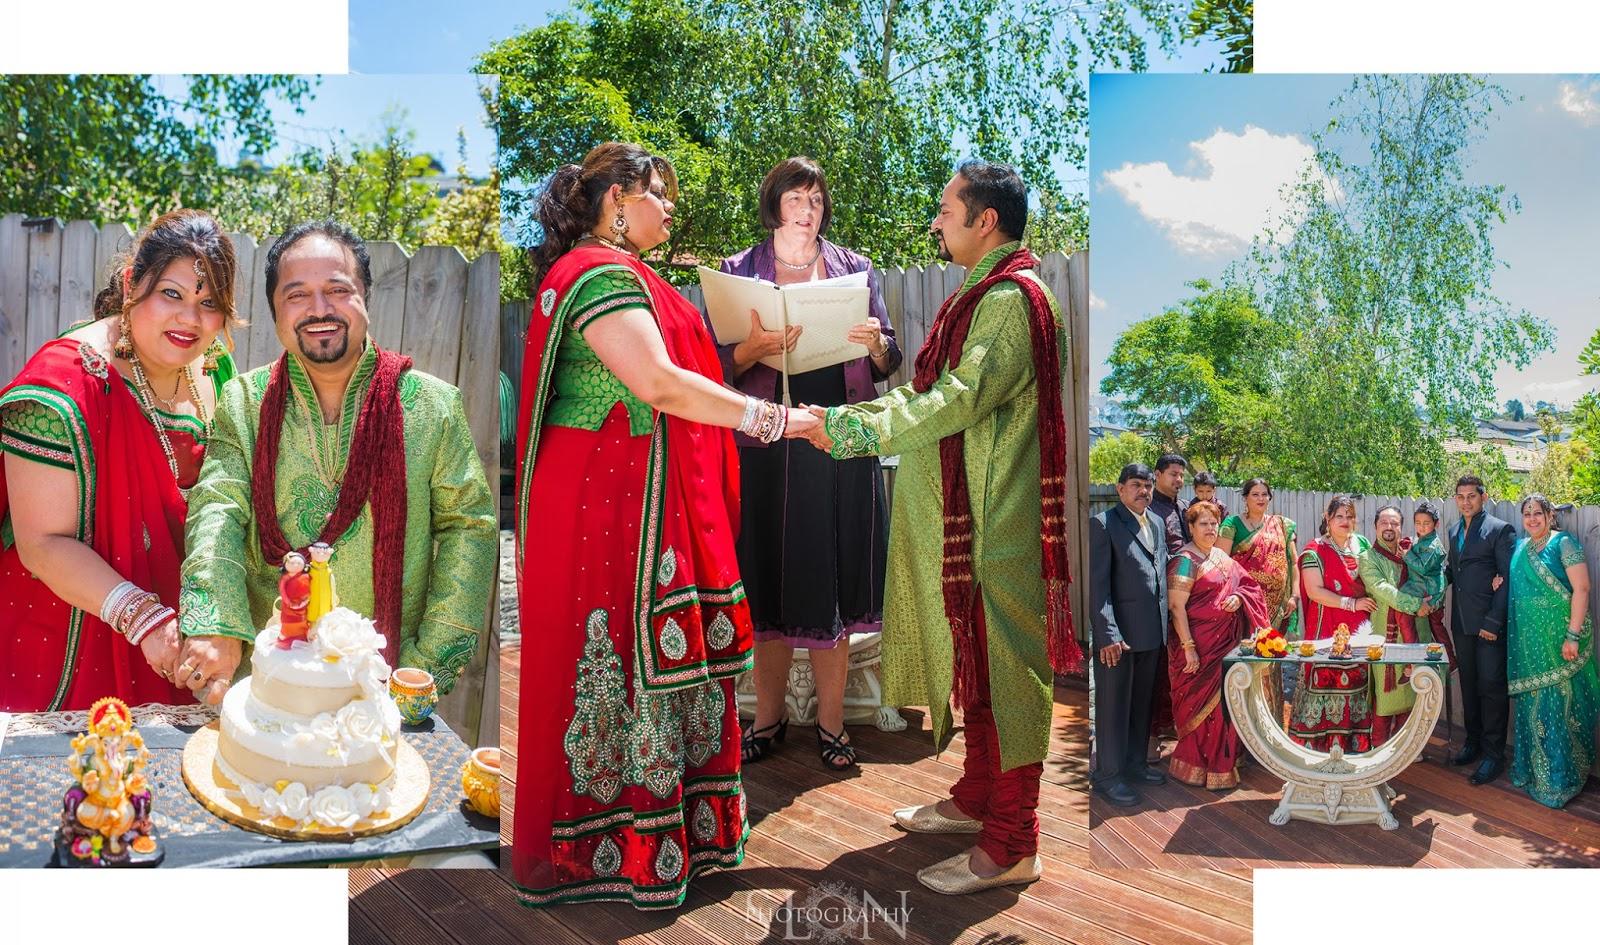 Colourful Cultural Wedding Celebrant Alexa Bartlett